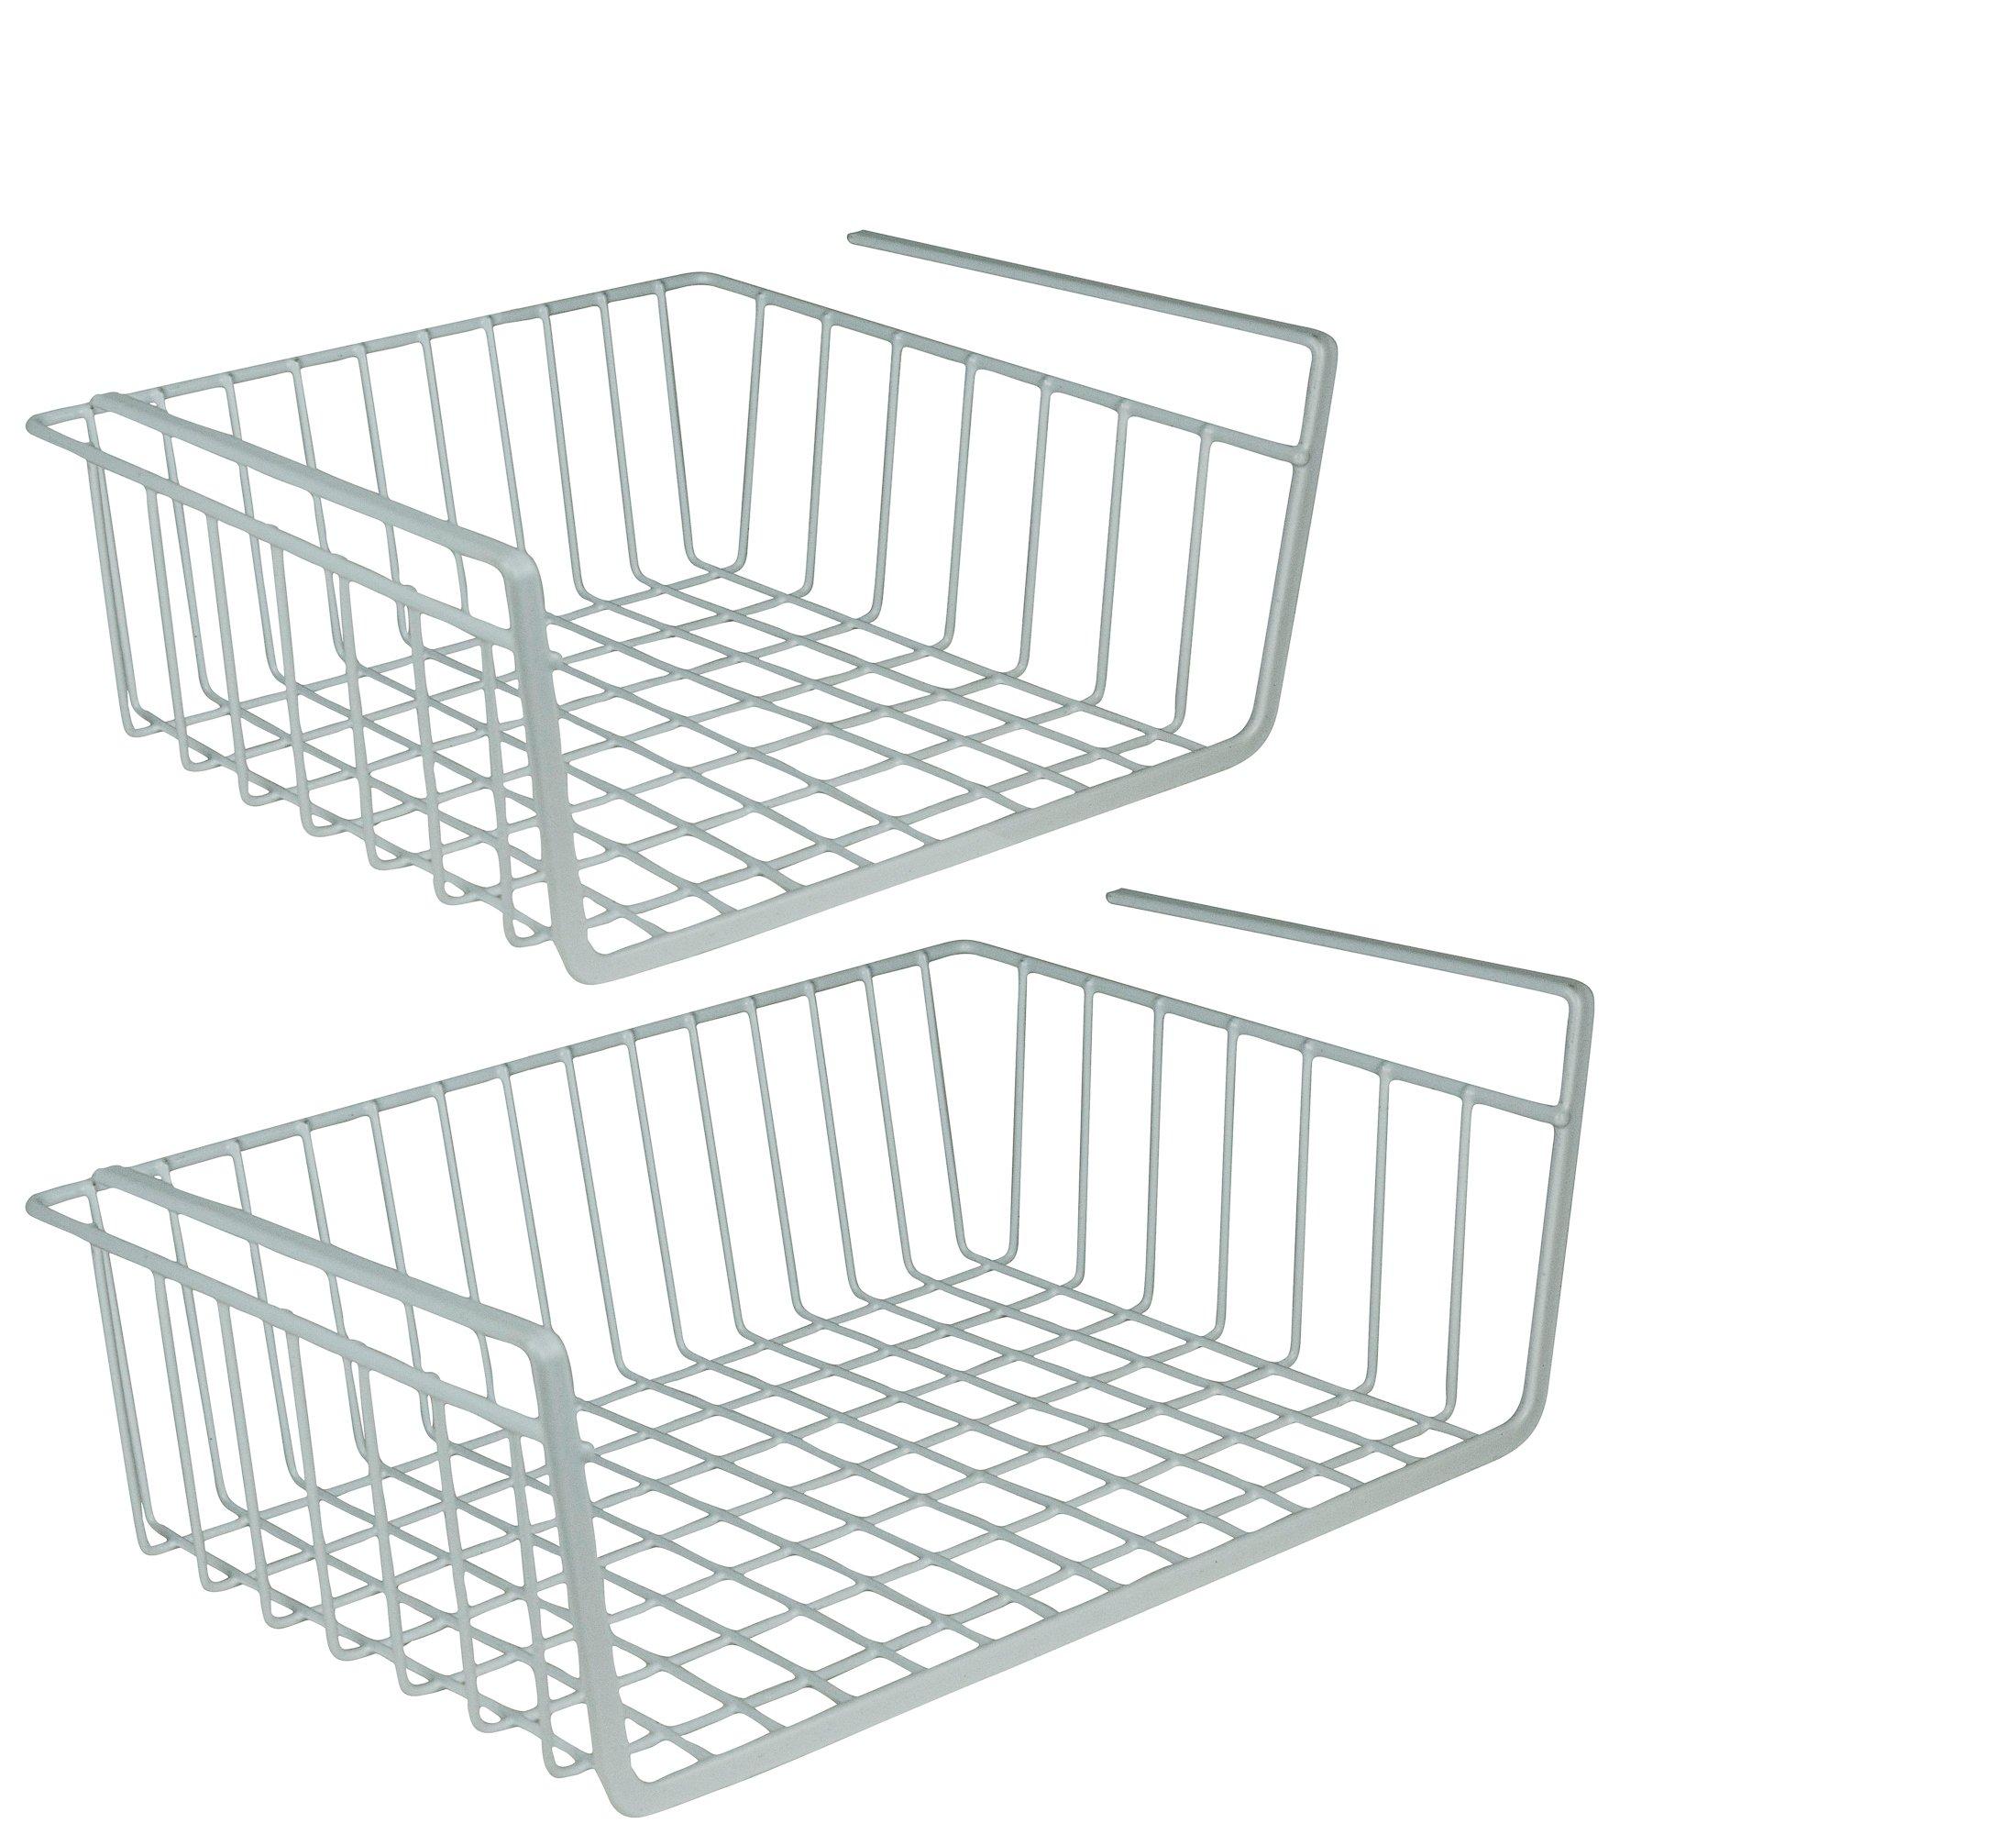 DecorRack Set of 2 Under Shelf Basket, Undershelf Wire Rack Storage Organizer with Hooks for Kitchen Pantry Cabinet Closet, Hanging Undershelf Basket Storage Rack, White (Set of 2)